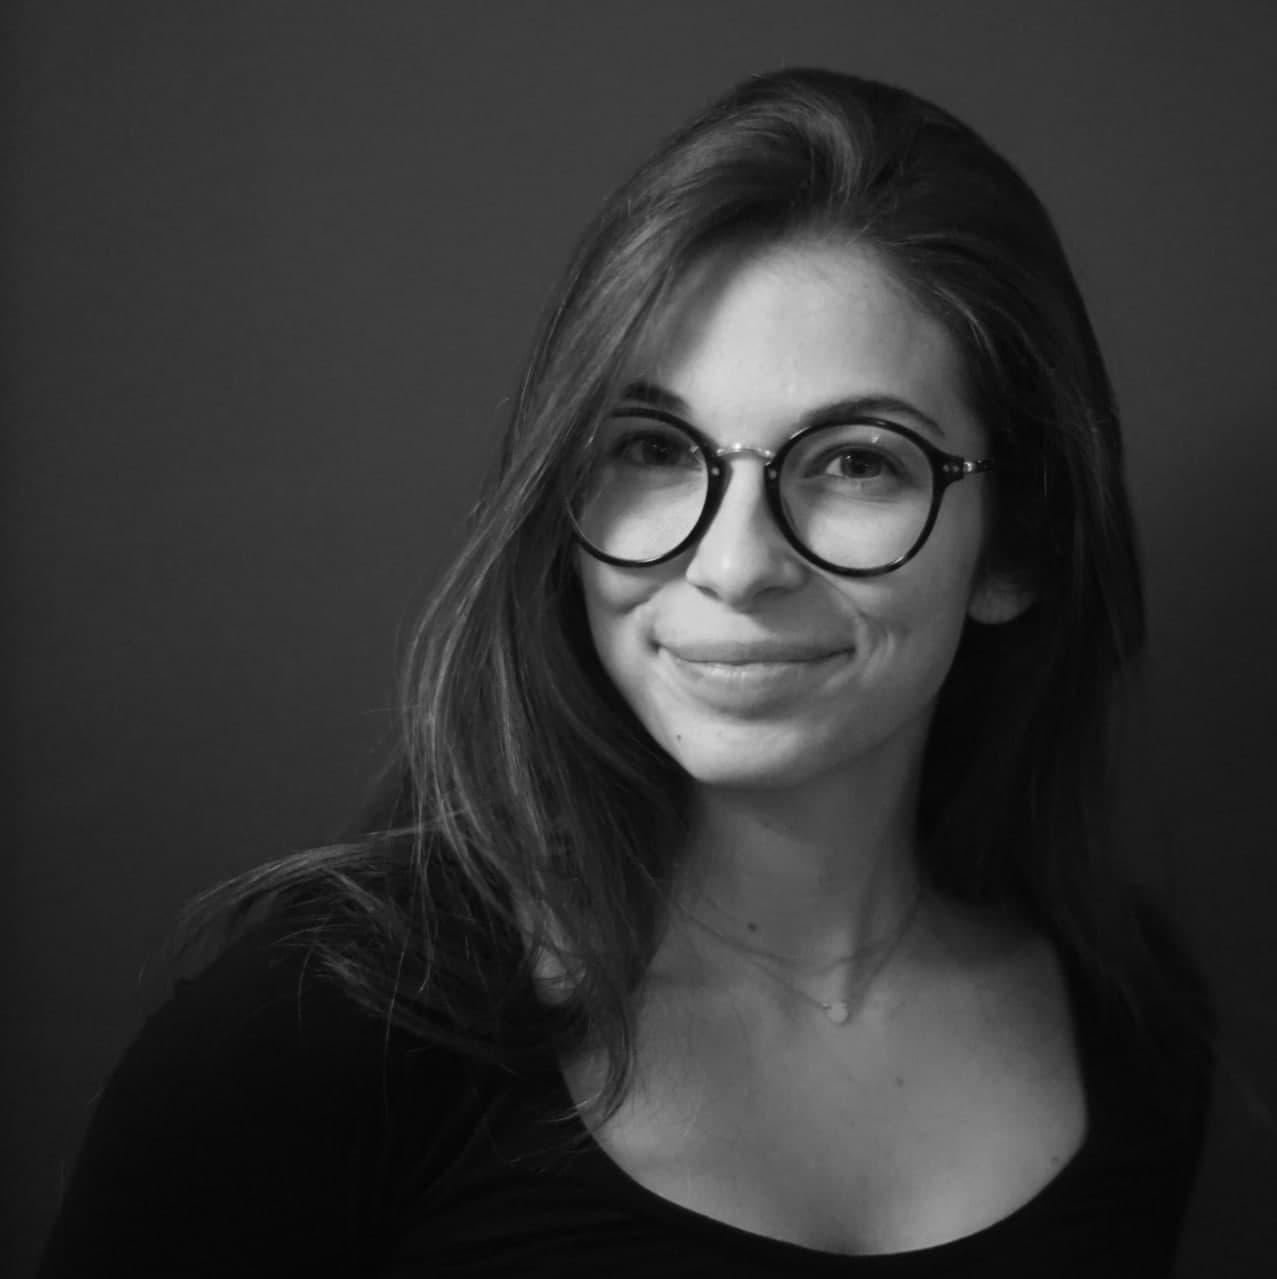 Alessandra Vulcano